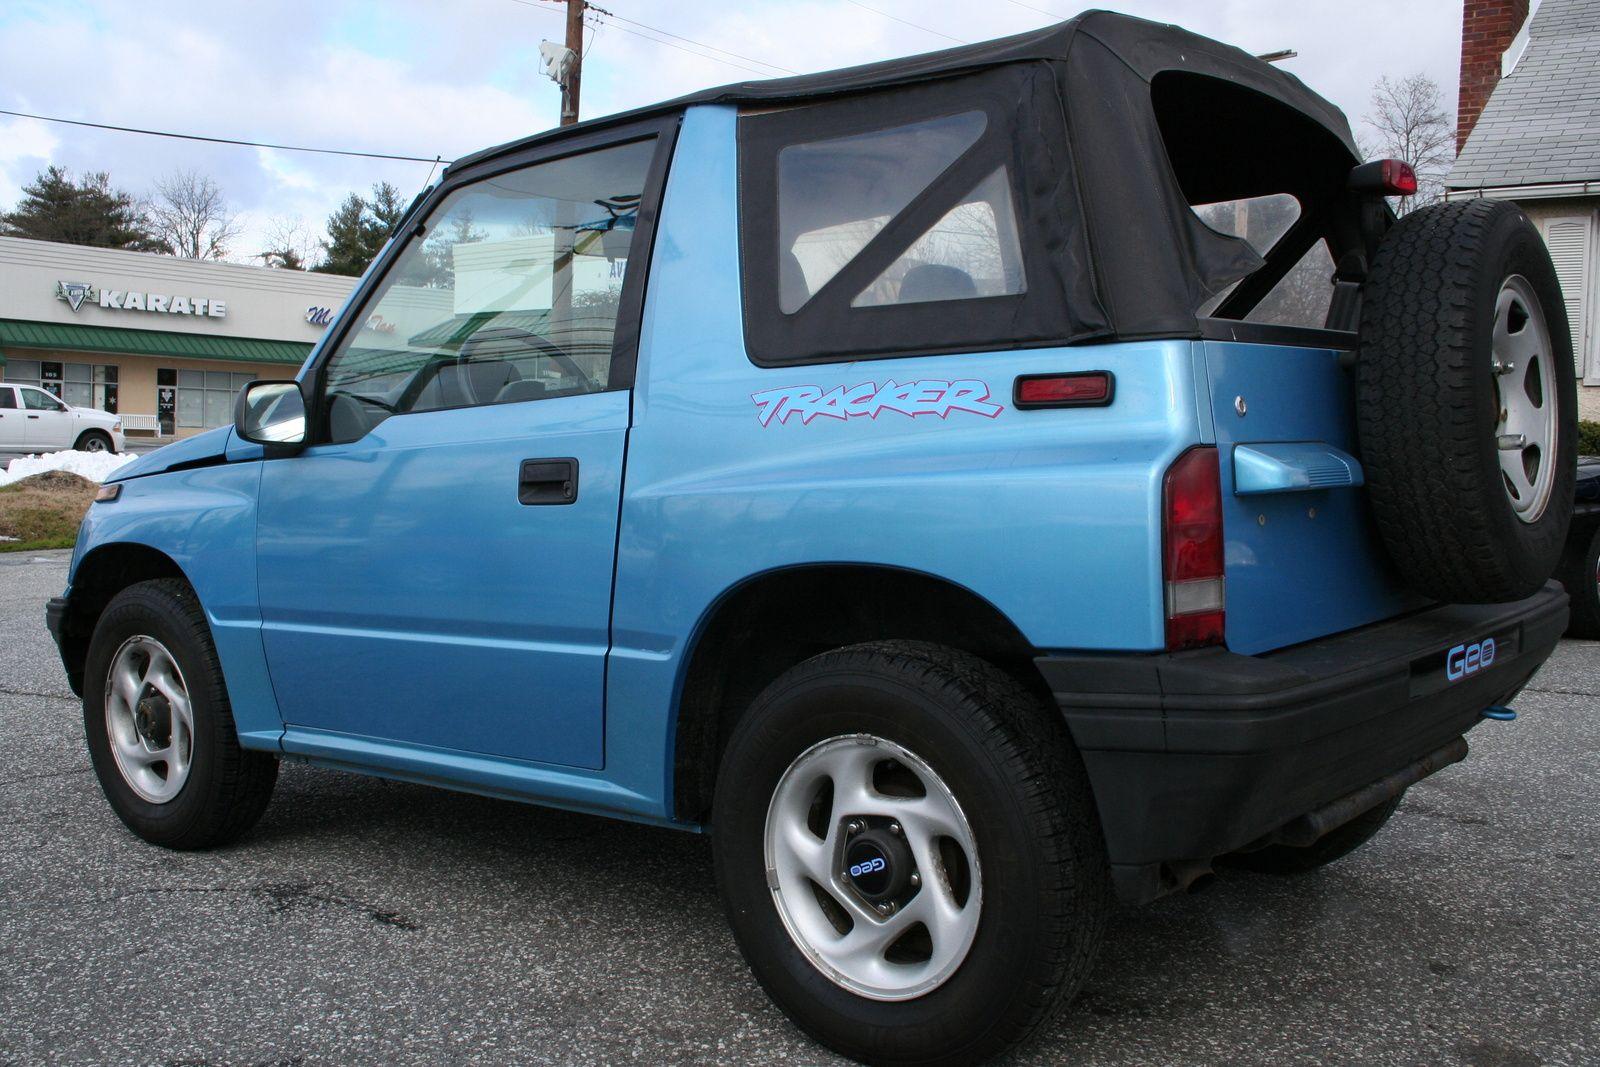 87 Cadillac Brougham Fuse Box Trusted Wiring Diagrams 91 Mercury Topaz 1990 Plymouth Sundance Diagram 1991 1992